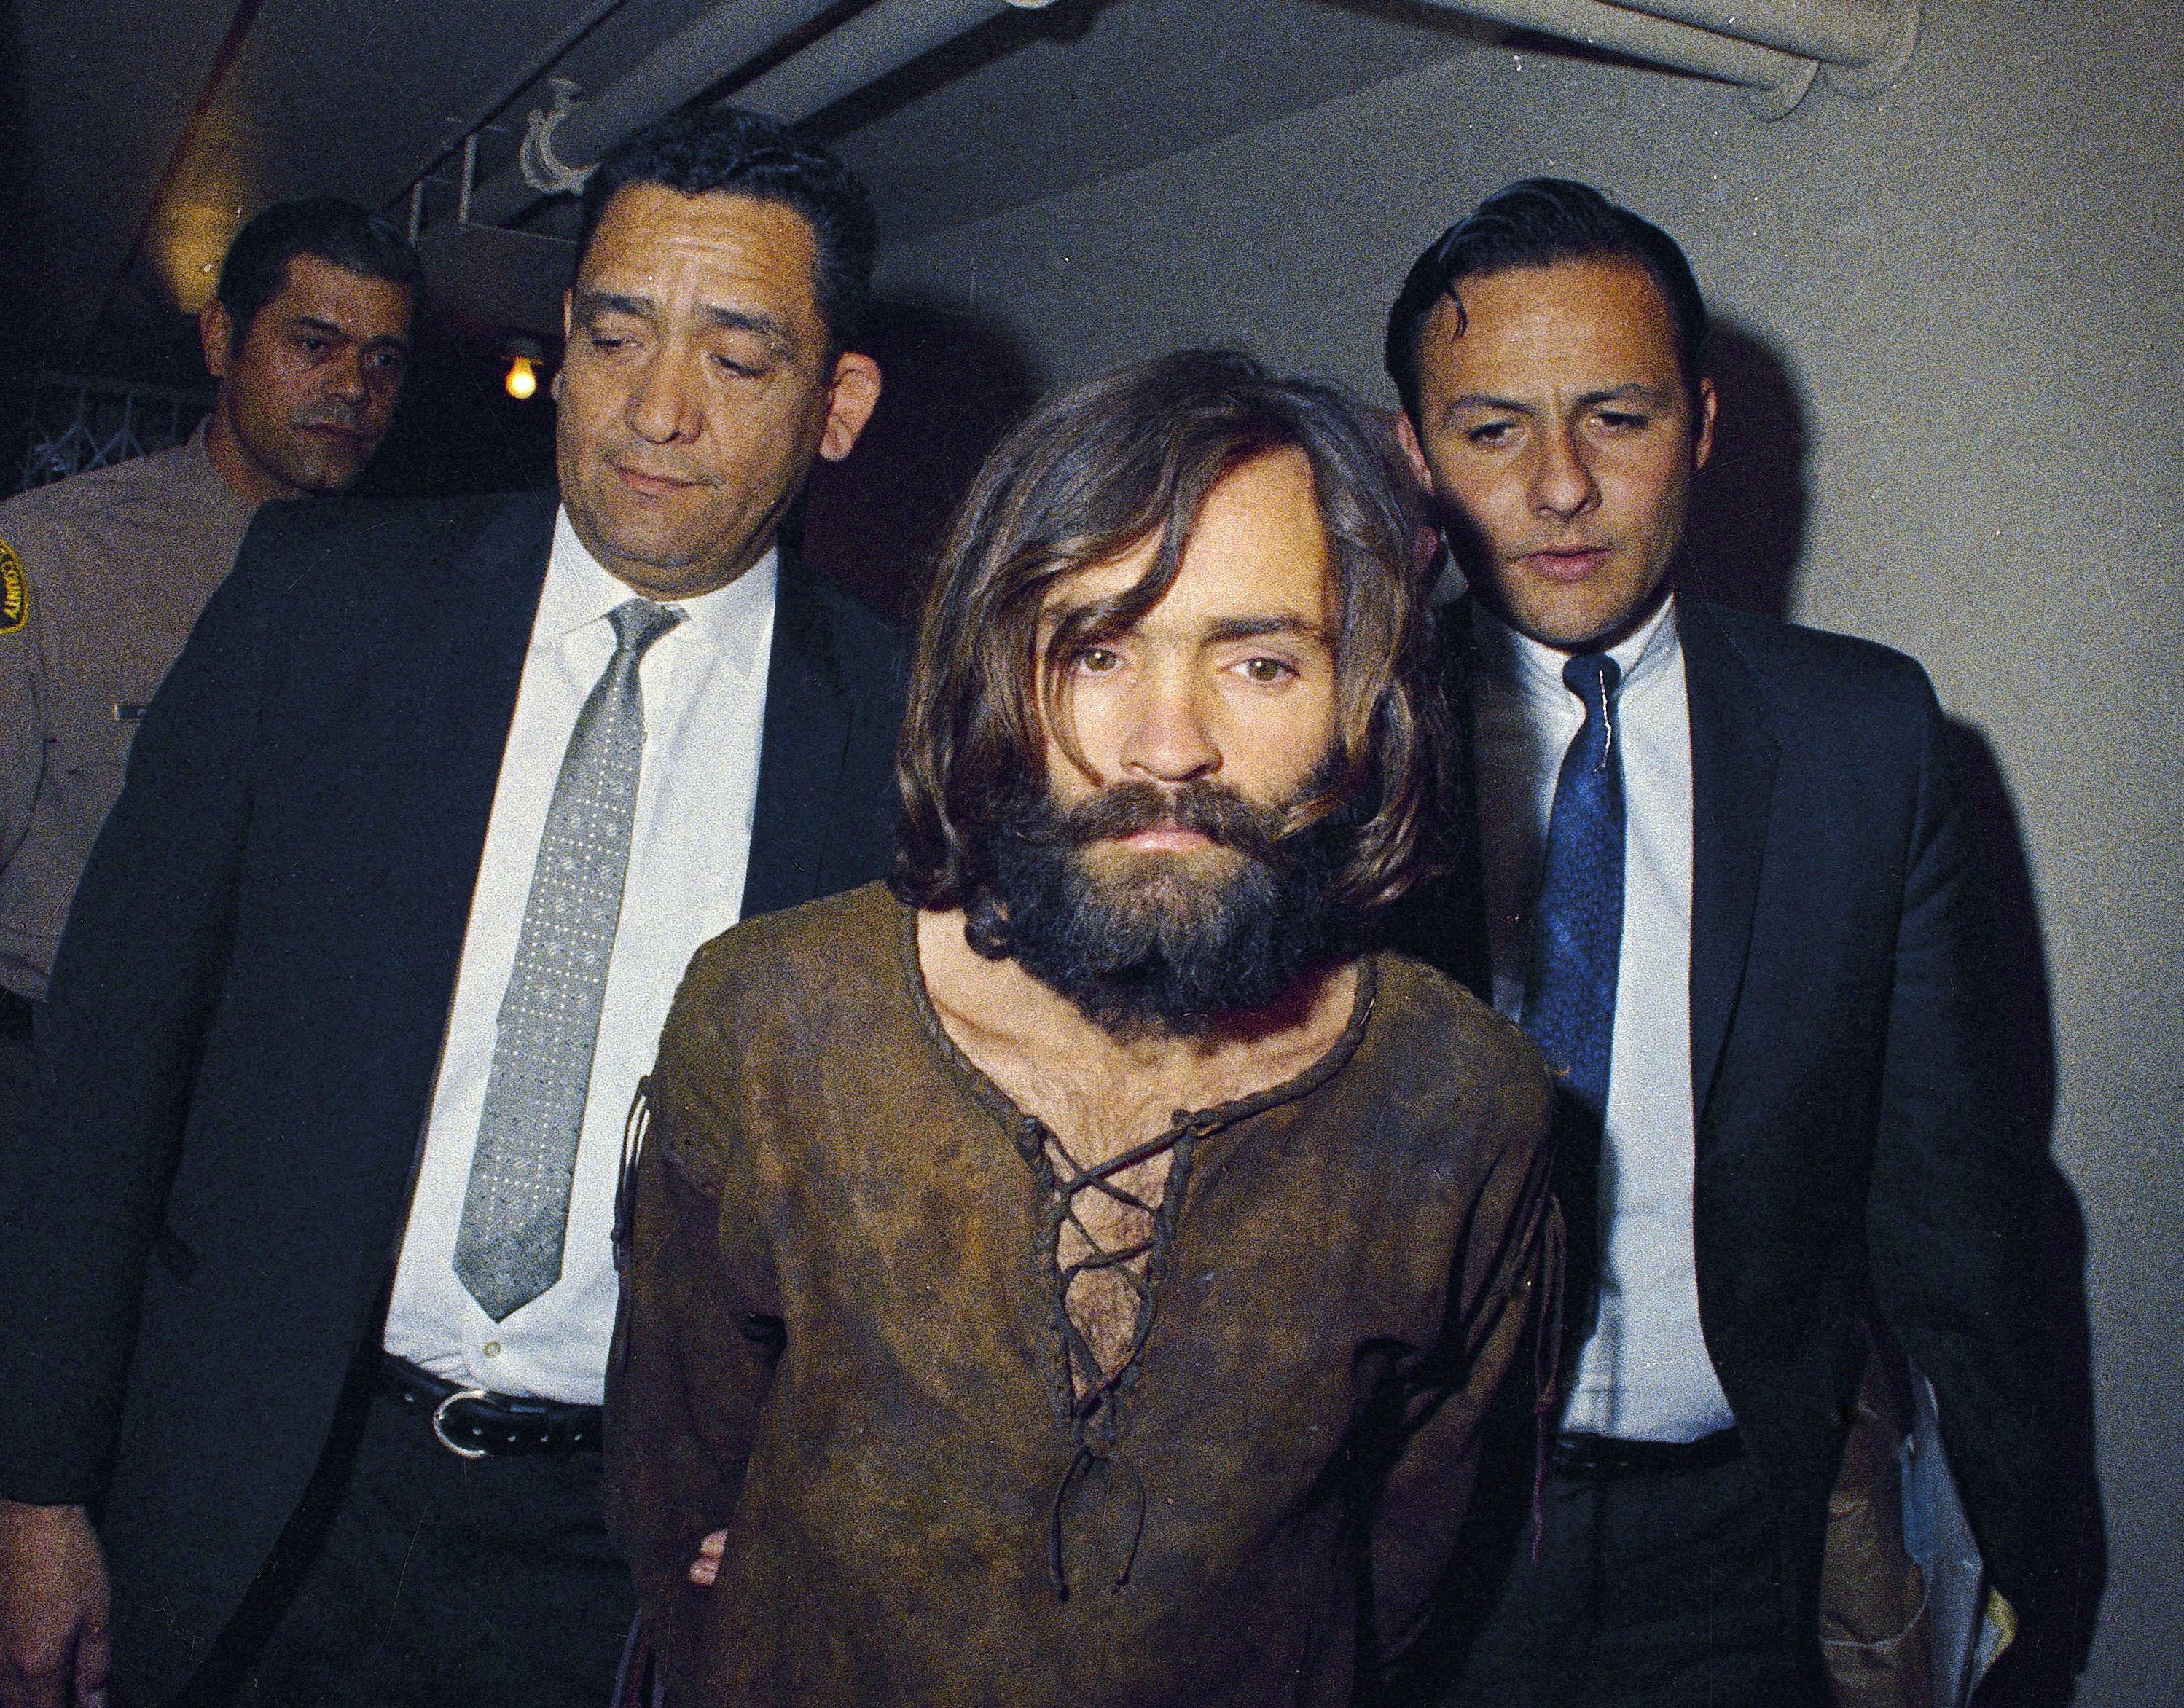 GoFundMe Shuts Down Fundraiser For Charles Manson's Funeral